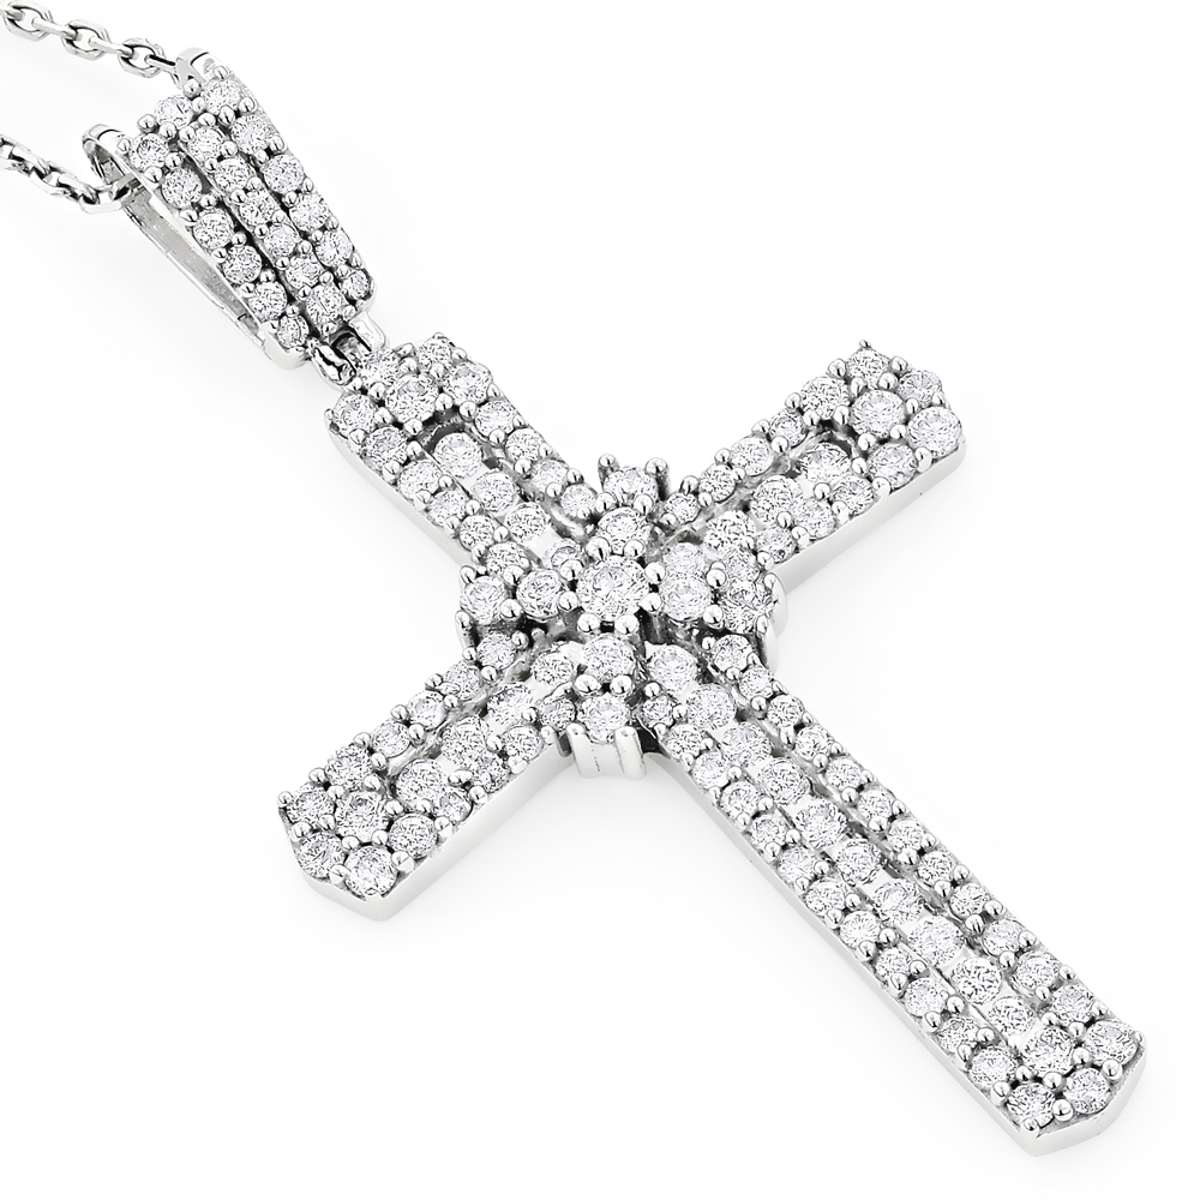 Intricate 14K Gold Designer Diamond Cross Pendant 1.48